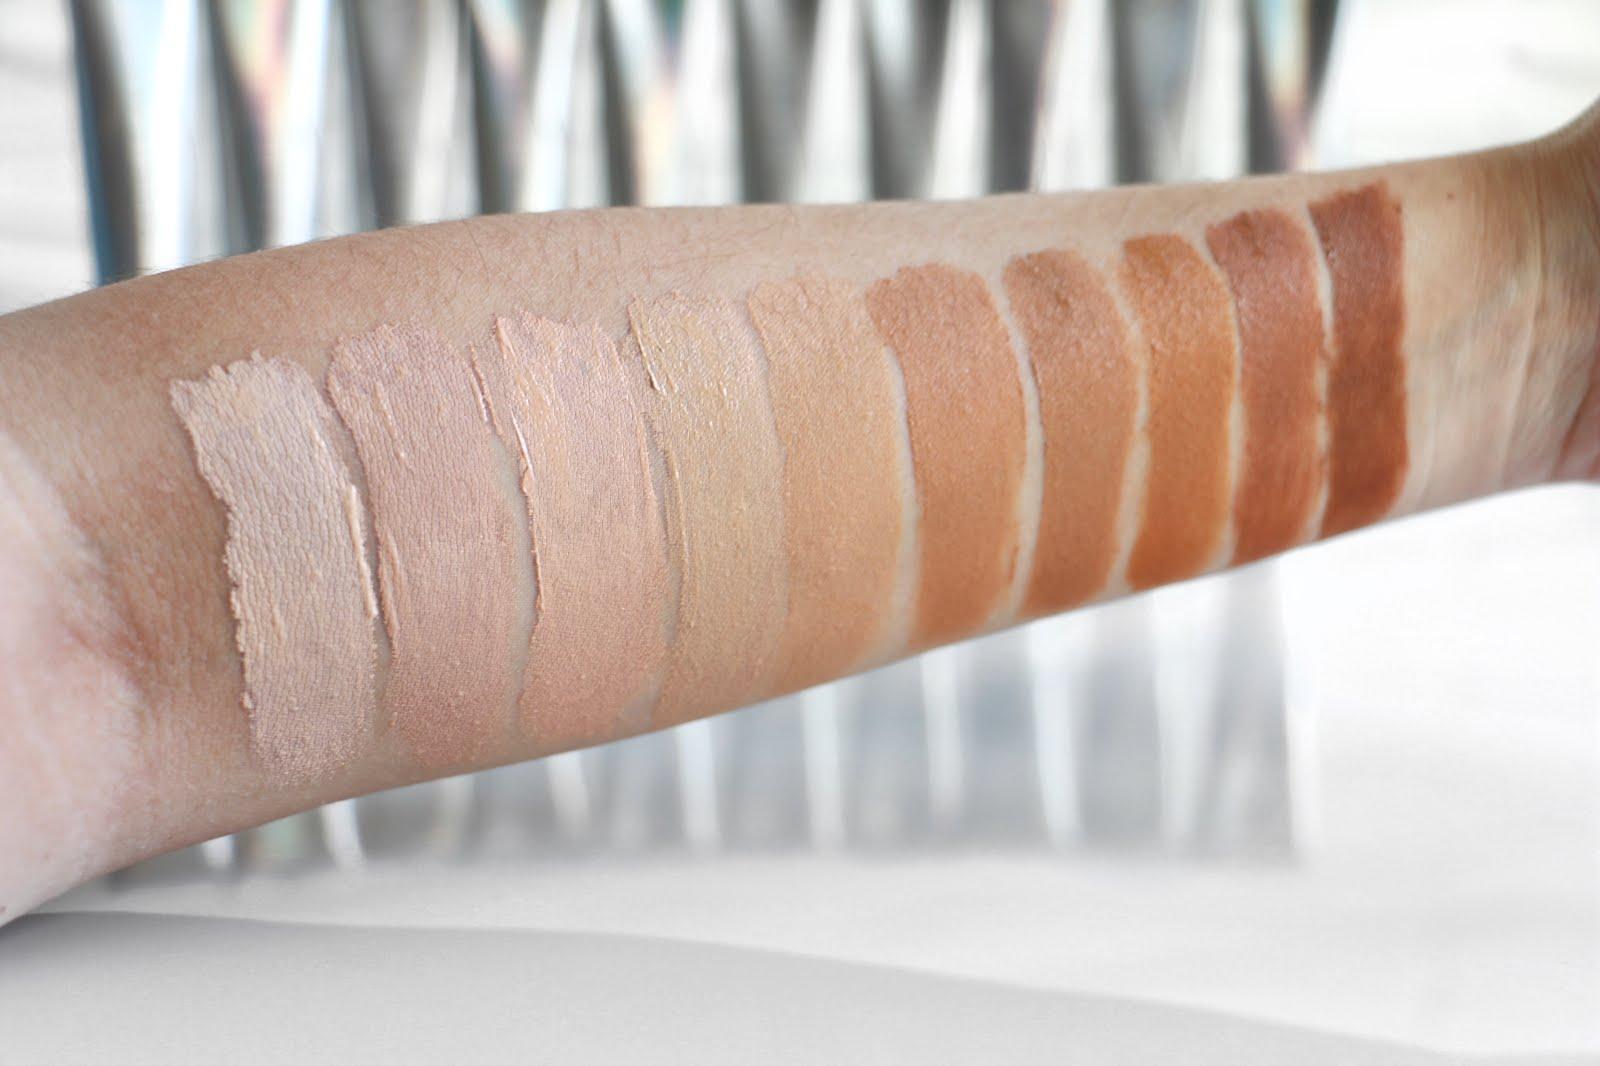 PÜR-Cosmetics-Bare-It-All-12-Hour-4-in-1-Skin-Perfecting-Foundation-Vivi-Brizuela-PinkOrchidMakeup